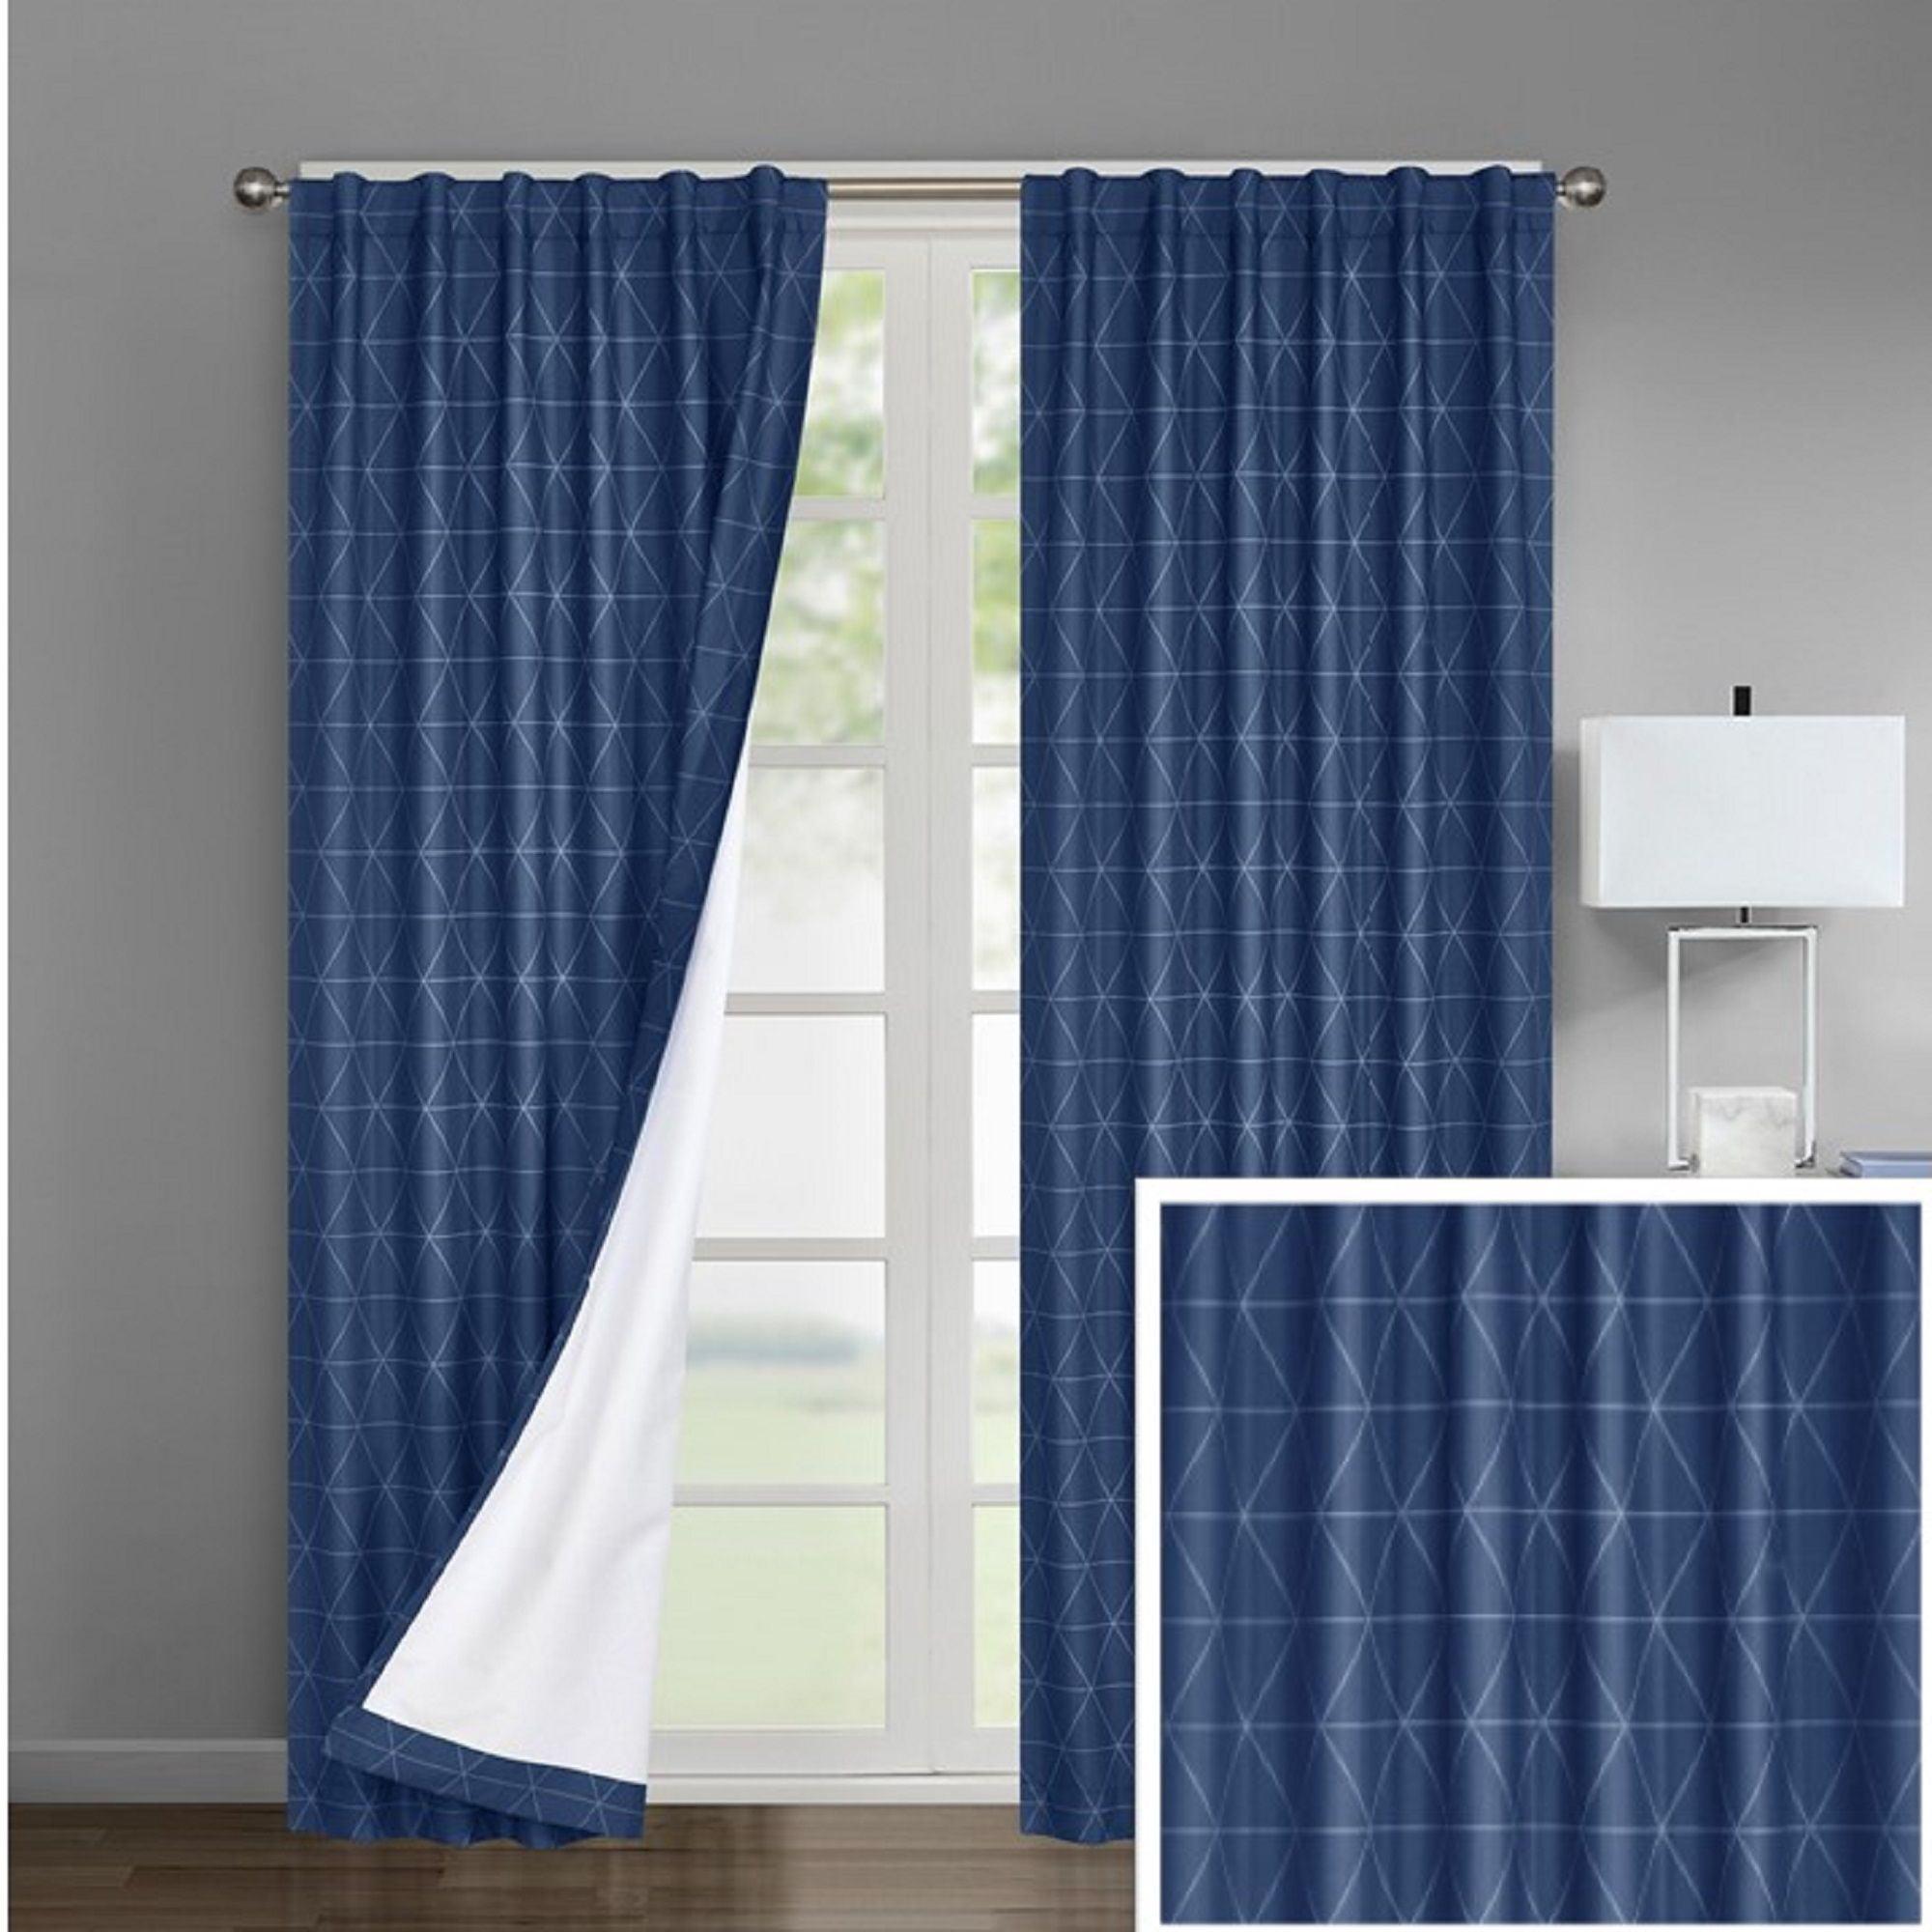 Urban Shop Geometric Print Room Darkening Rod Pocket Curtain Panel Set Of 2 Walmart Com Walmart Com